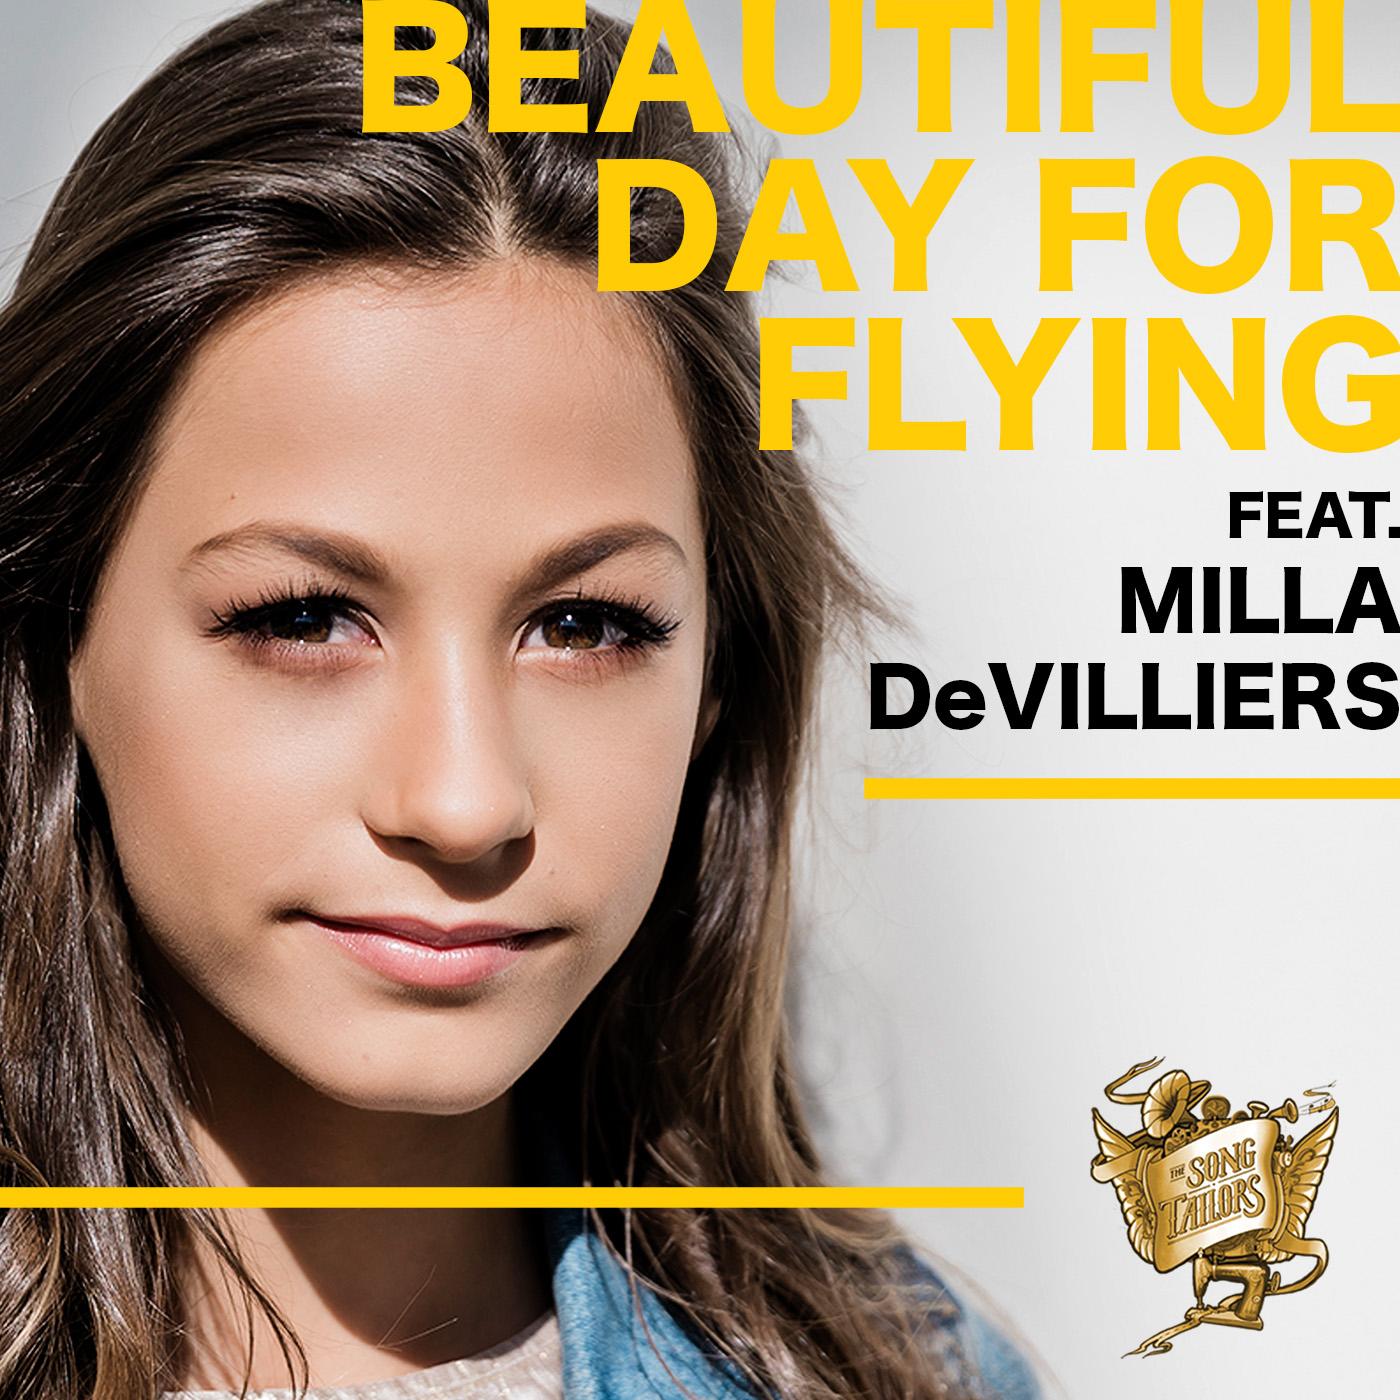 Milla DeVilliers ST_KIT_iTCover_v2 (1) (1).jpg